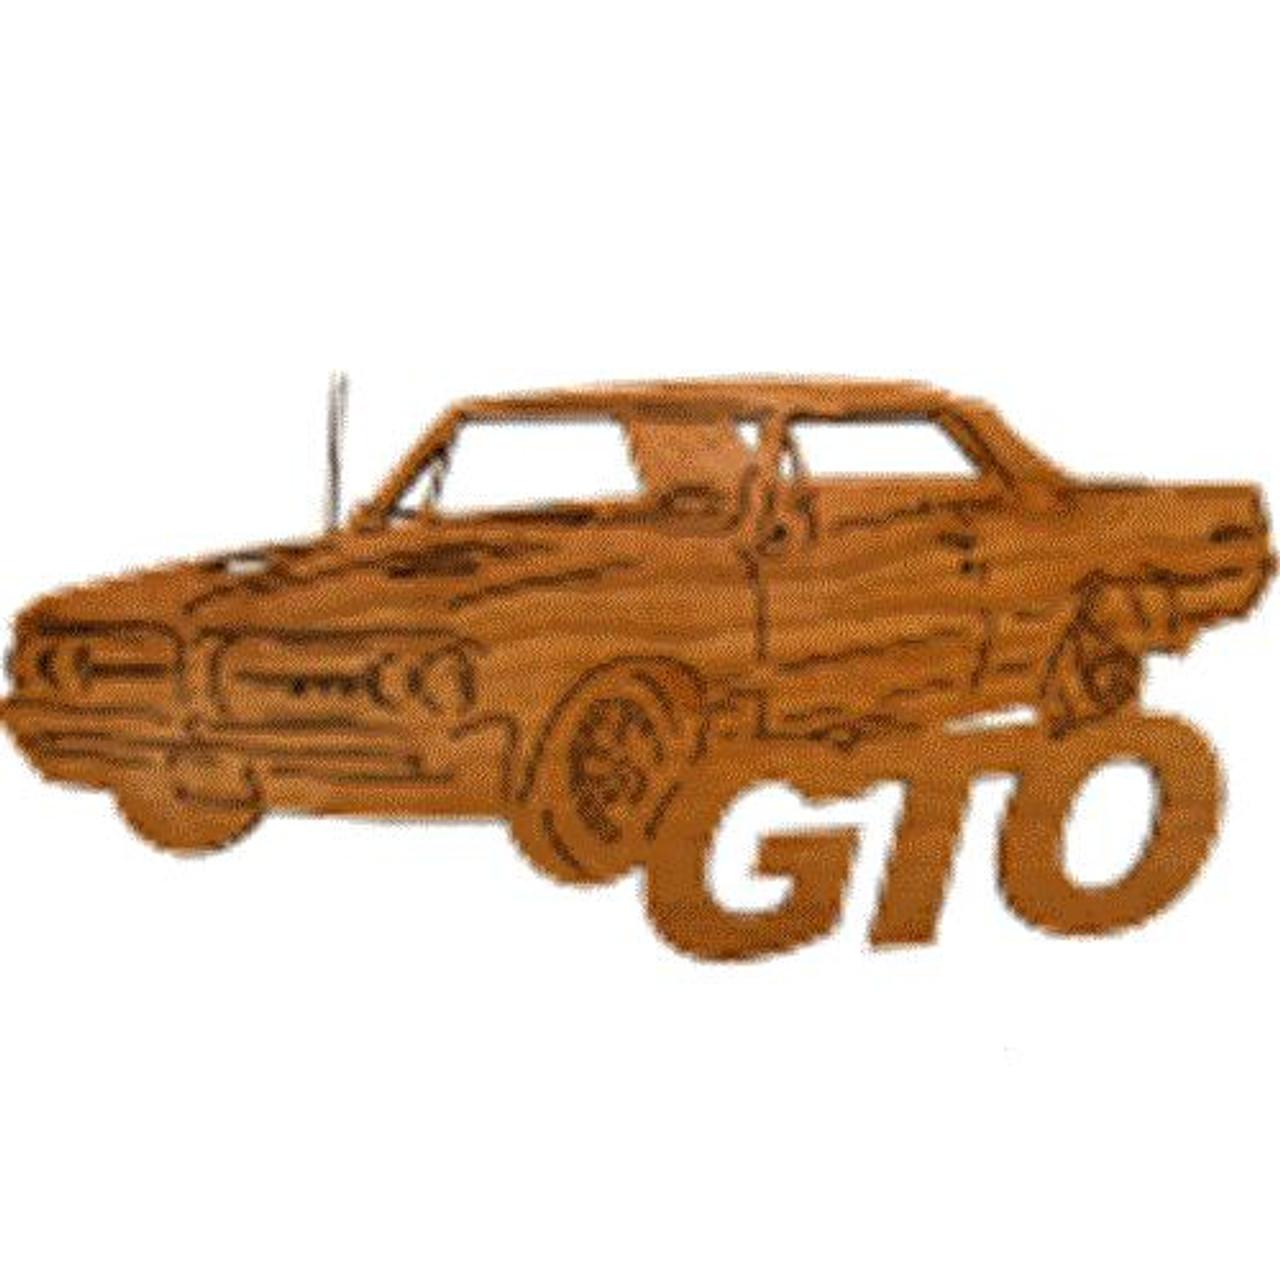 Wildwood Designs GTO Muscle Car Plan